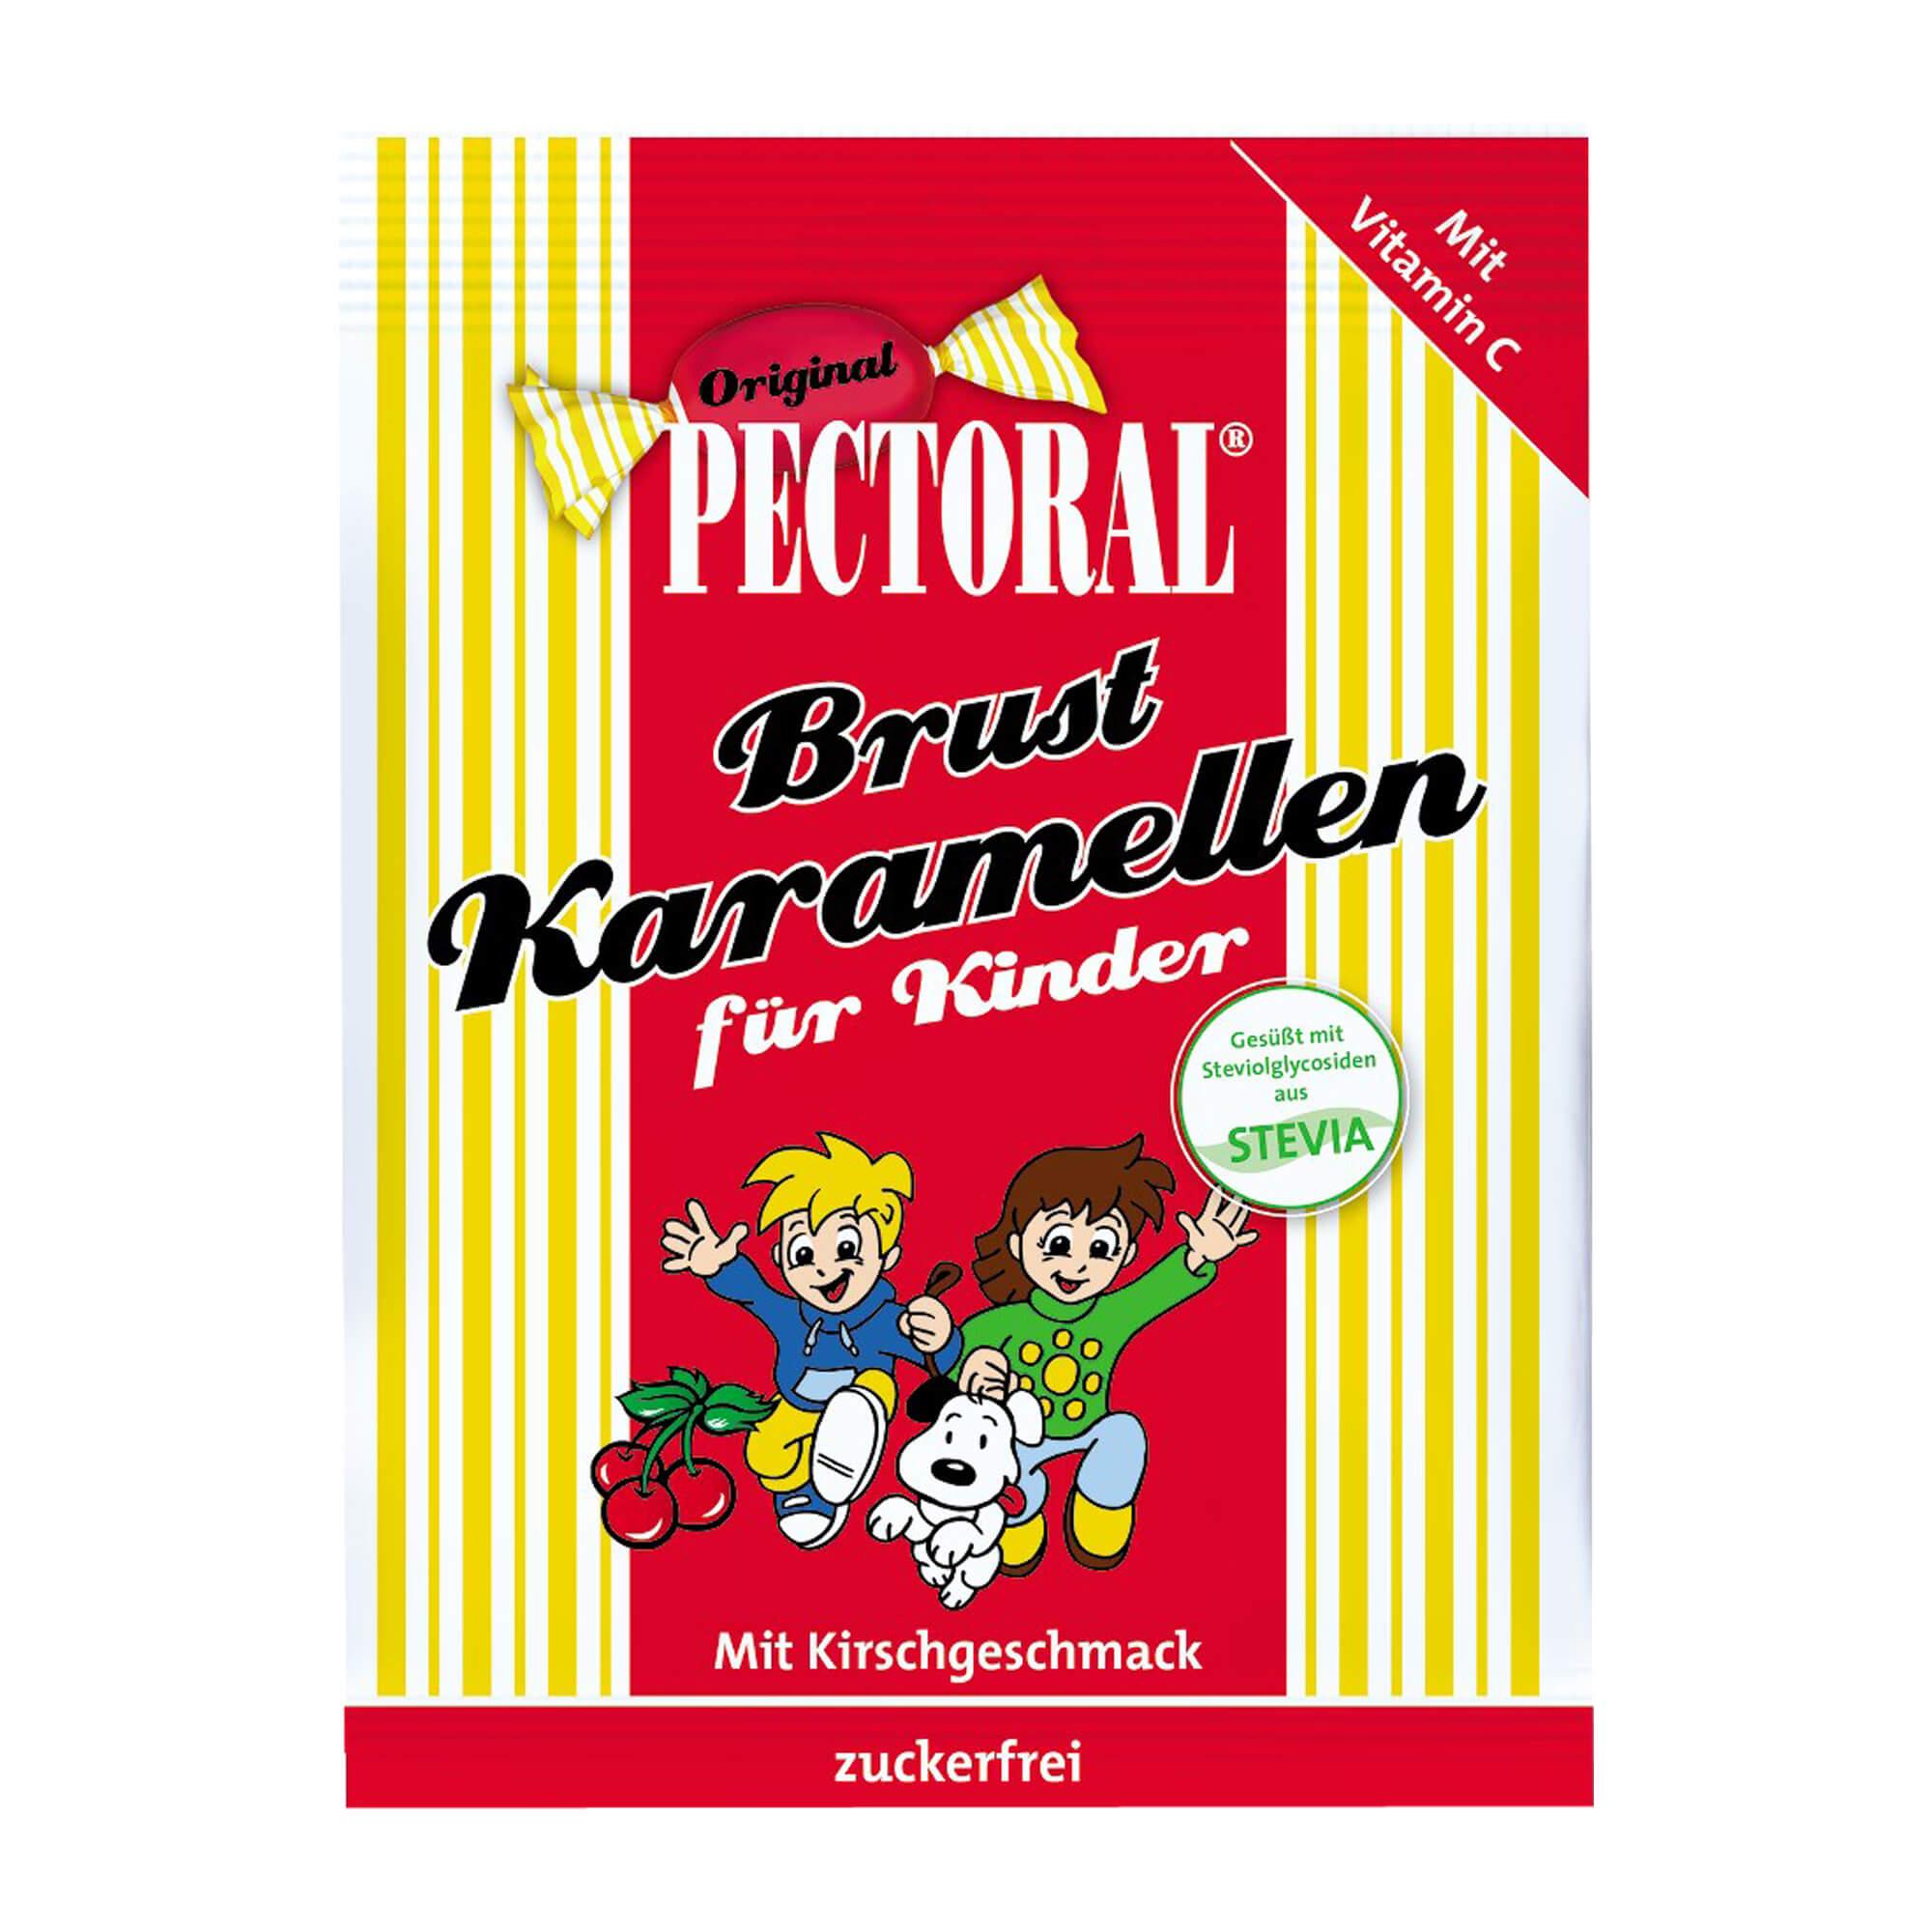 Pectoral für Kinder Bonbons